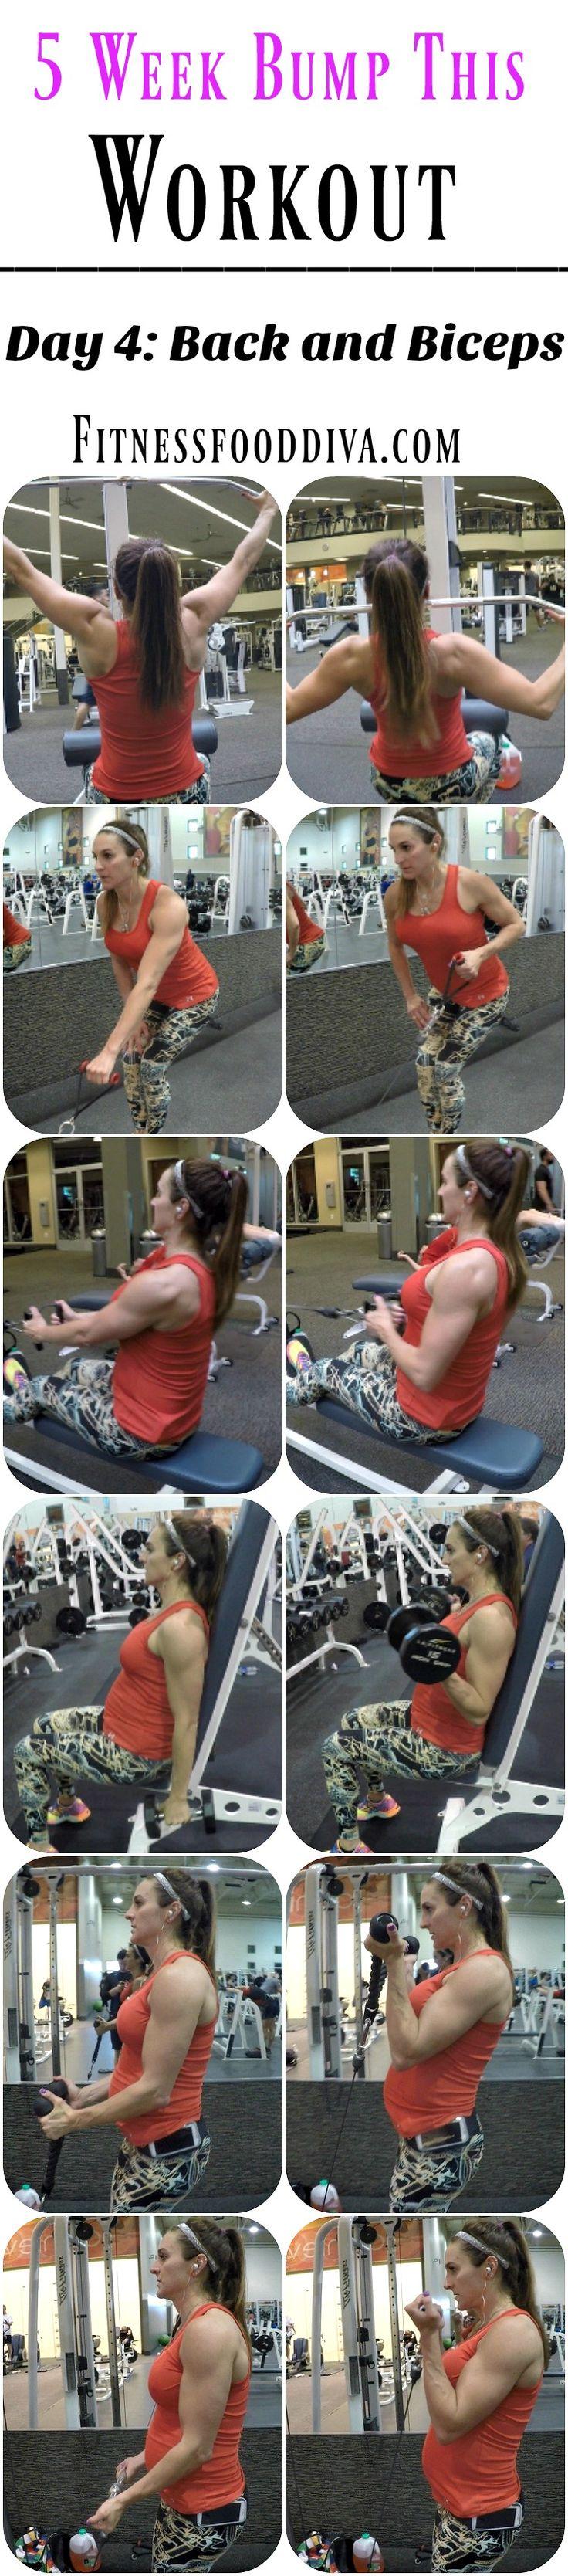 5 Week Bump This Workout!